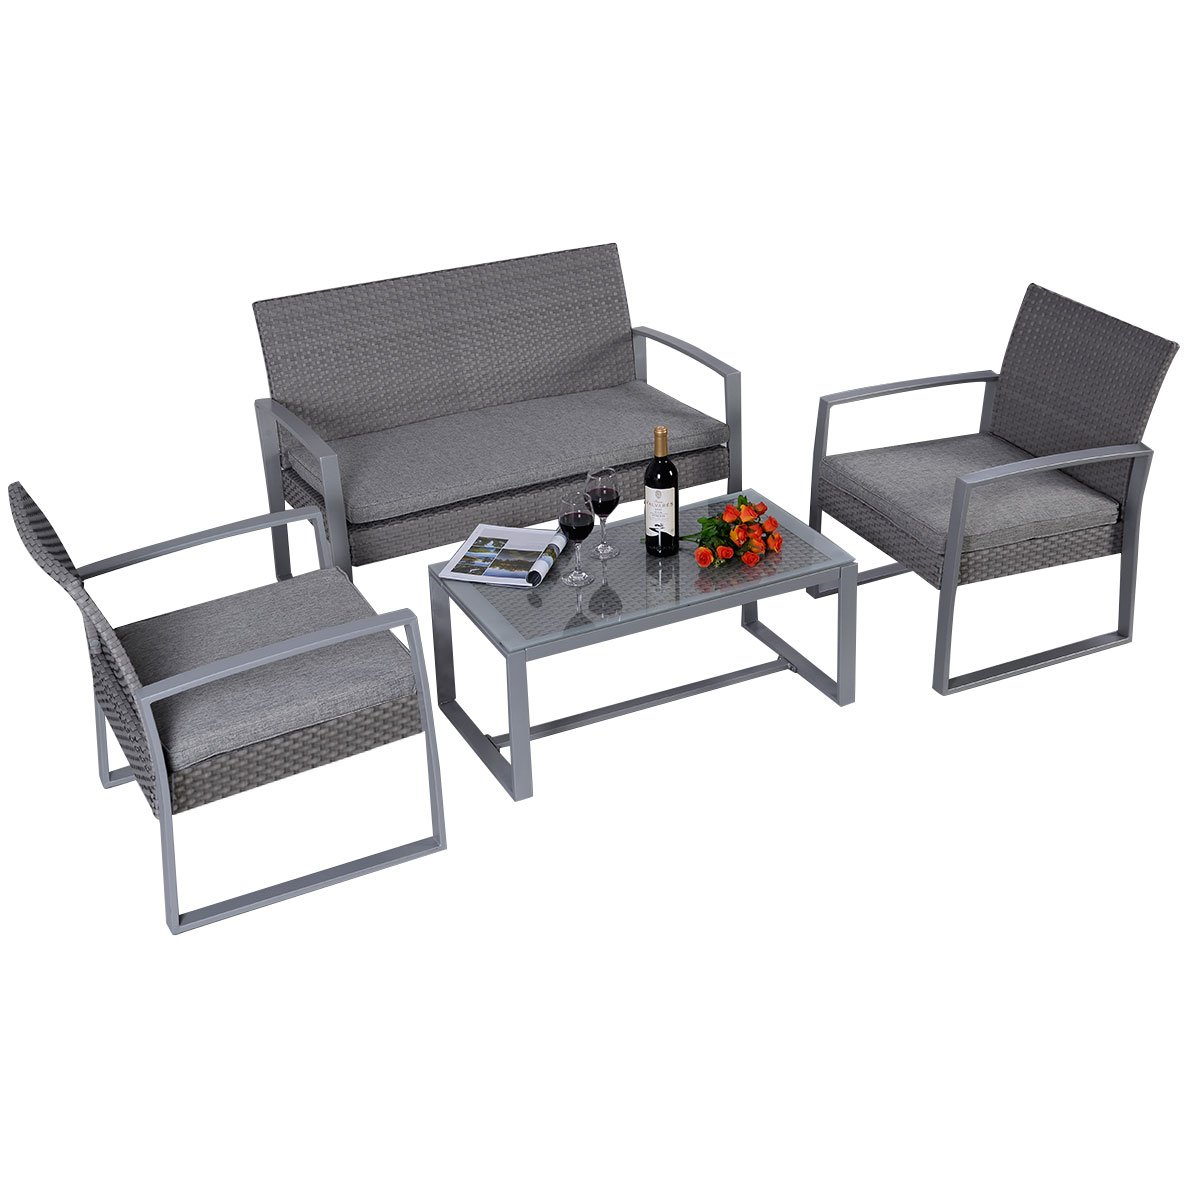 Amazon.de: Polyrattan Rattan Set Lounge Gartenmöbel Garten ... Sitzgruppe Im Garten Gartenmobel Sets